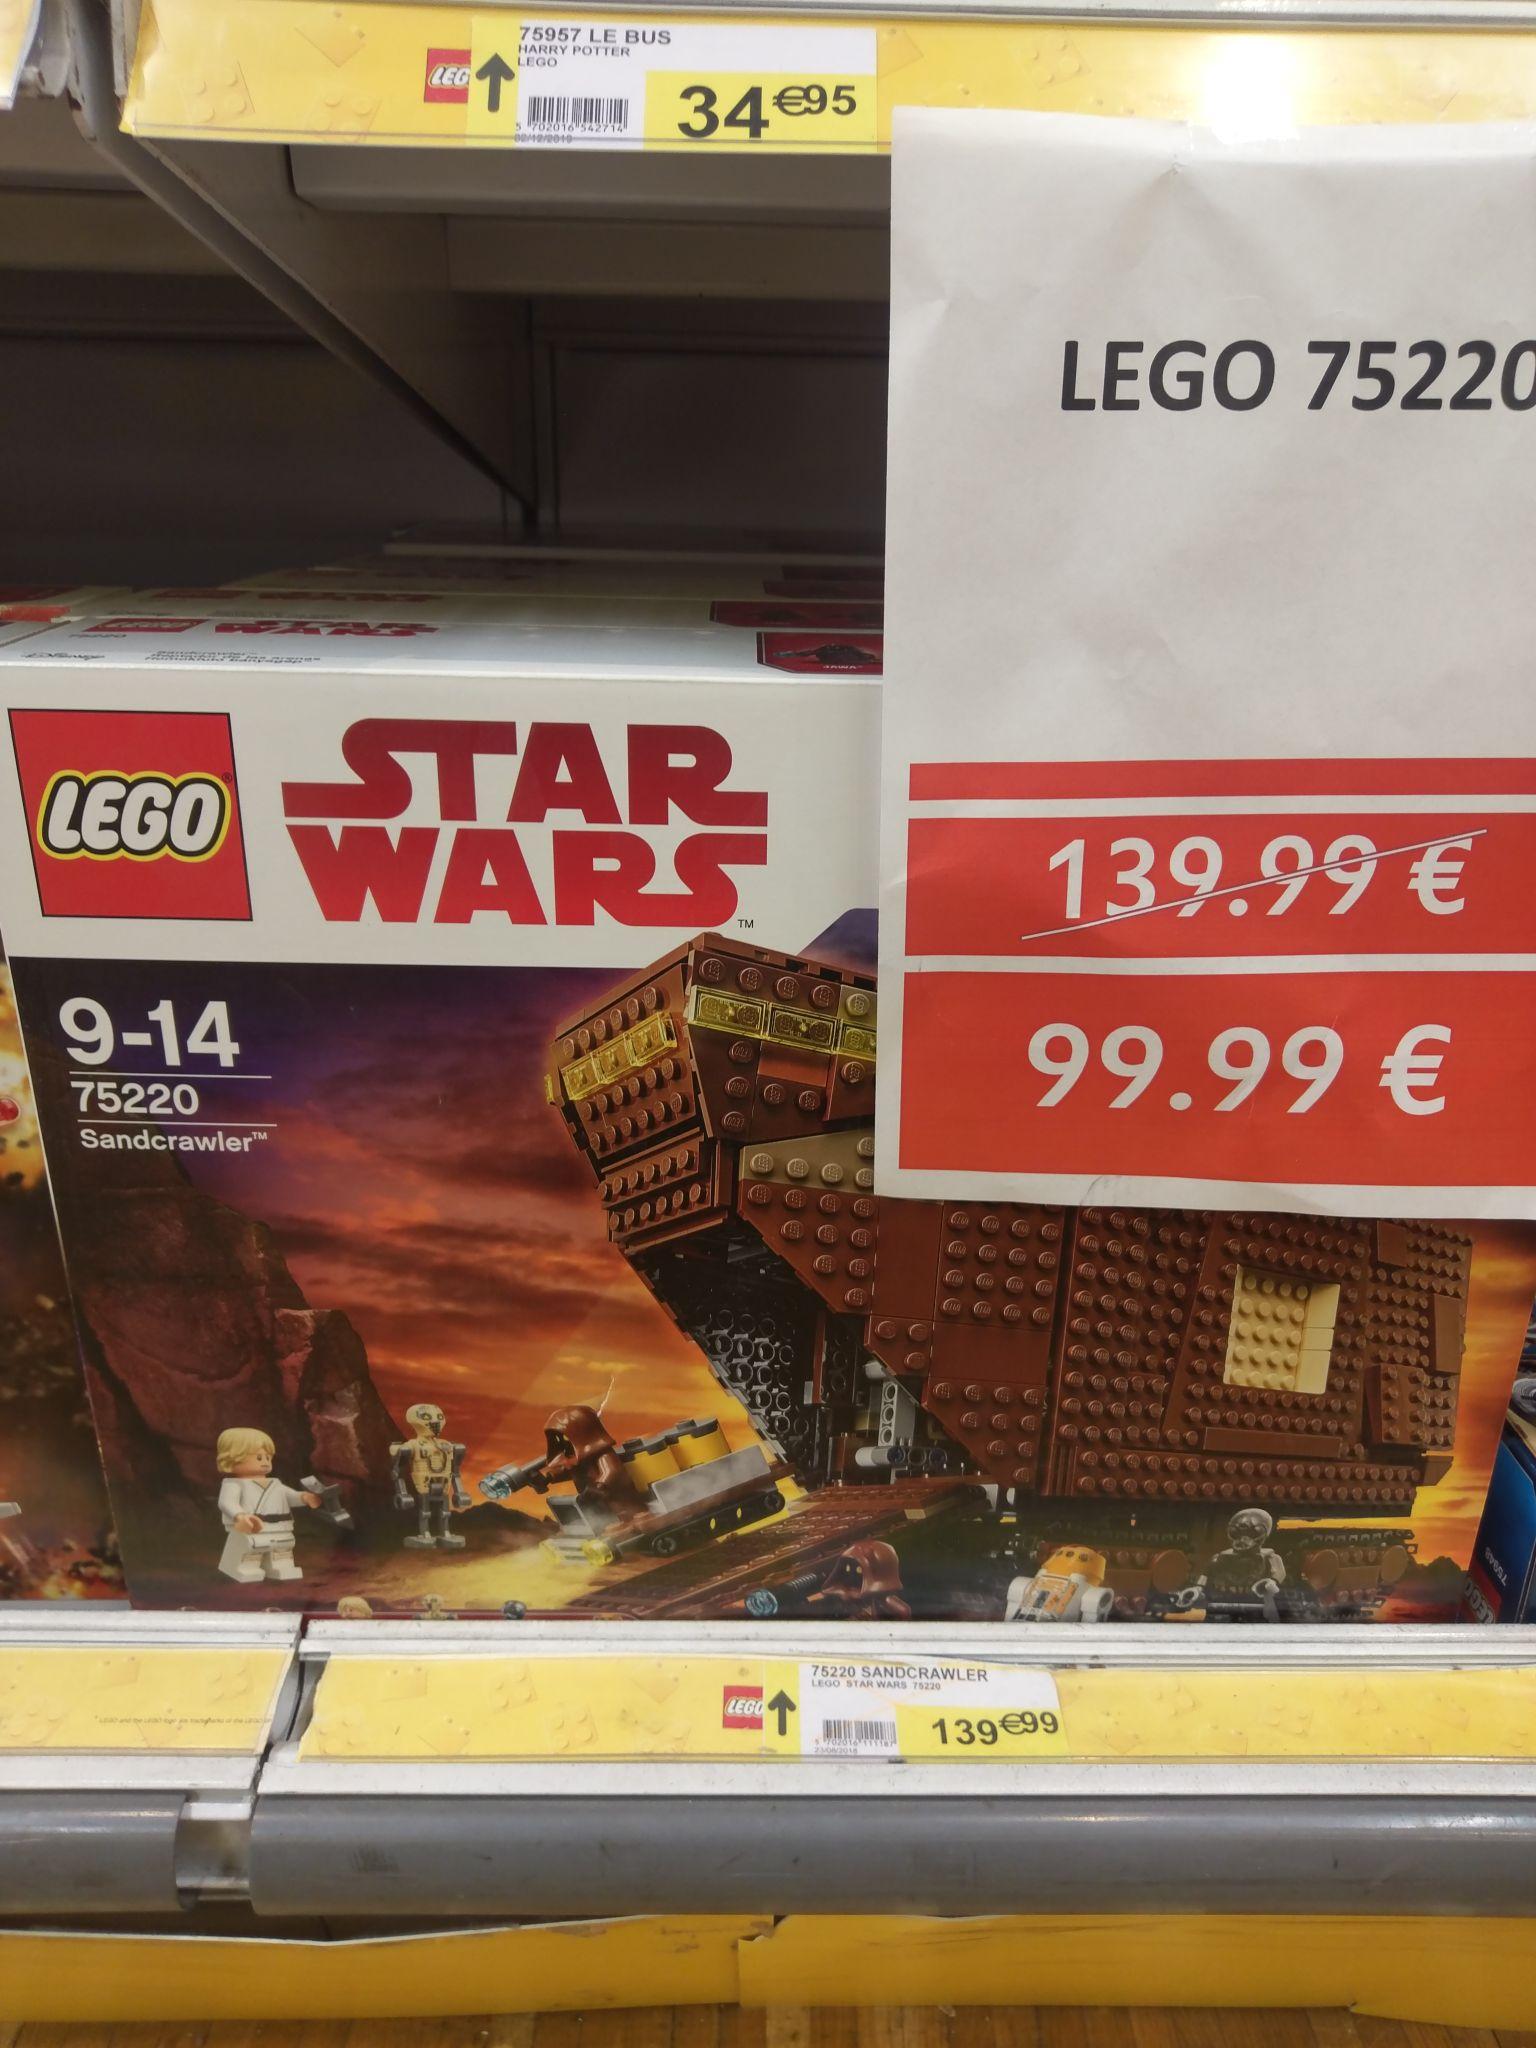 Lego Star Wars 75220 Sandcrowler - Cora Houdemont (54)